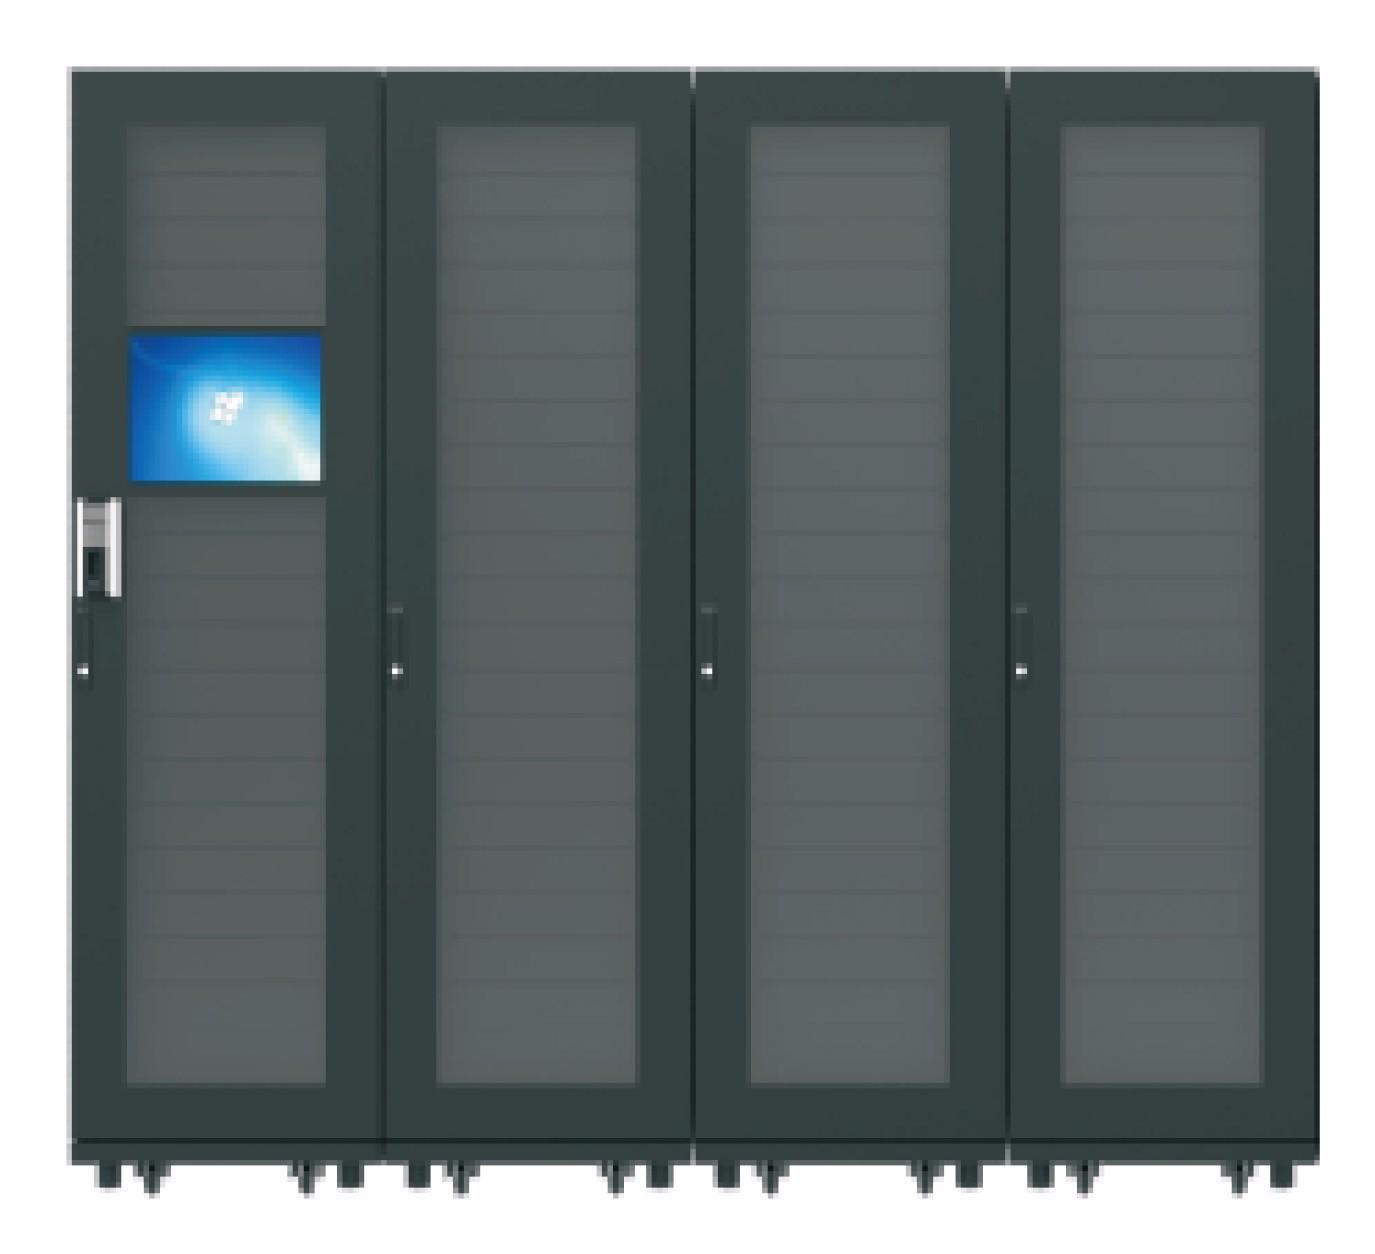 Energy Data Center All In One Module Manufacturers, Energy Data Center All In One Module Factory, Supply Energy Data Center All In One Module